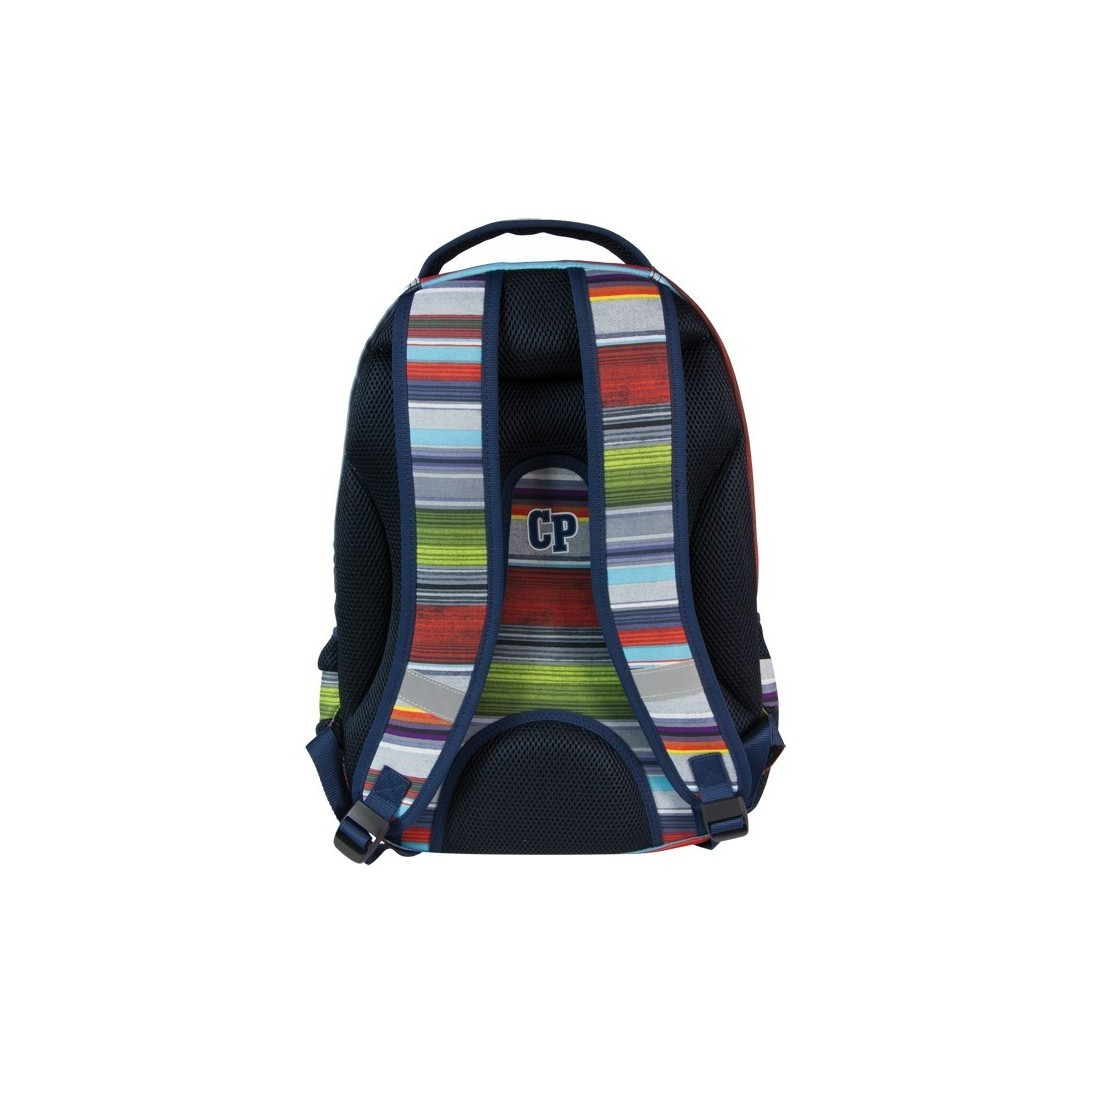 PLECAK MŁODZIEŻOWY COOLPACK COLLEGE STRIPES CP 141 - plecak-tornister.pl